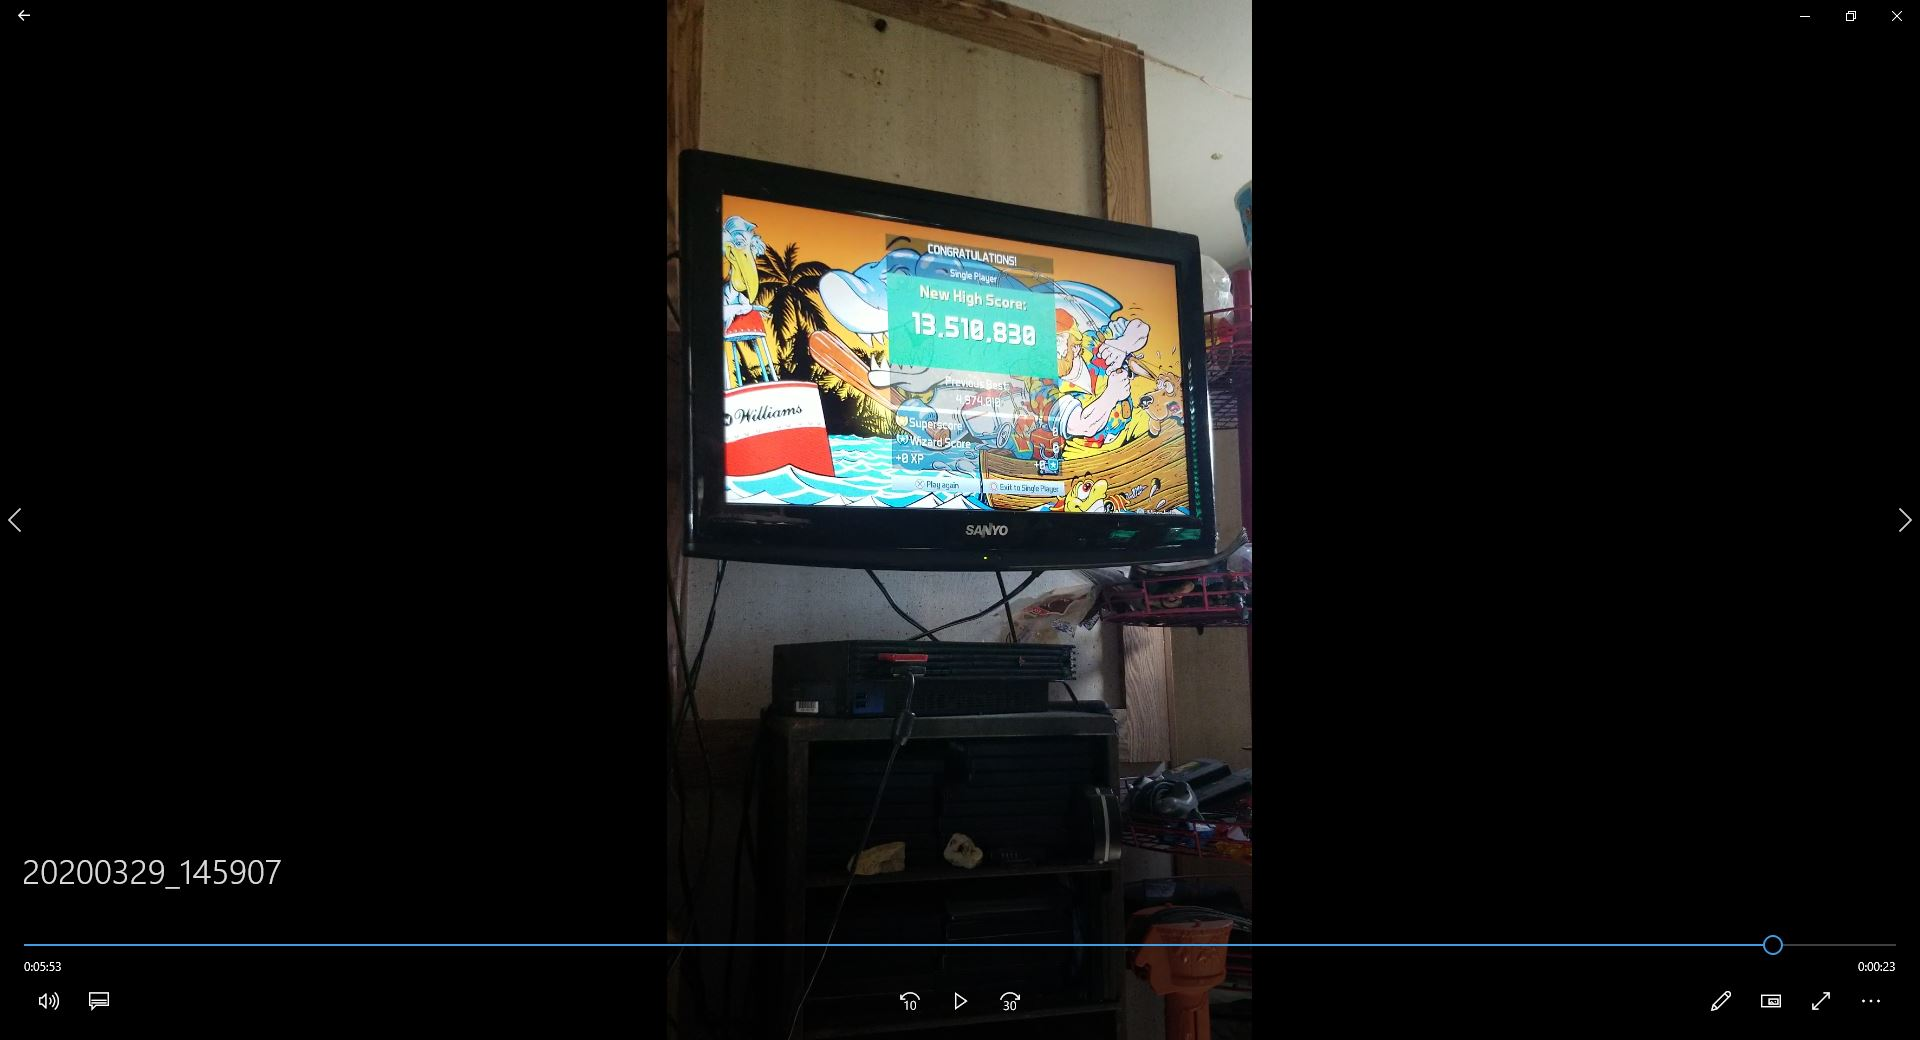 speedy4759123: Pinball FX3: Fish Tales [Standard] (Playstation 4) 13,510,830 points on 2020-03-29 21:39:24